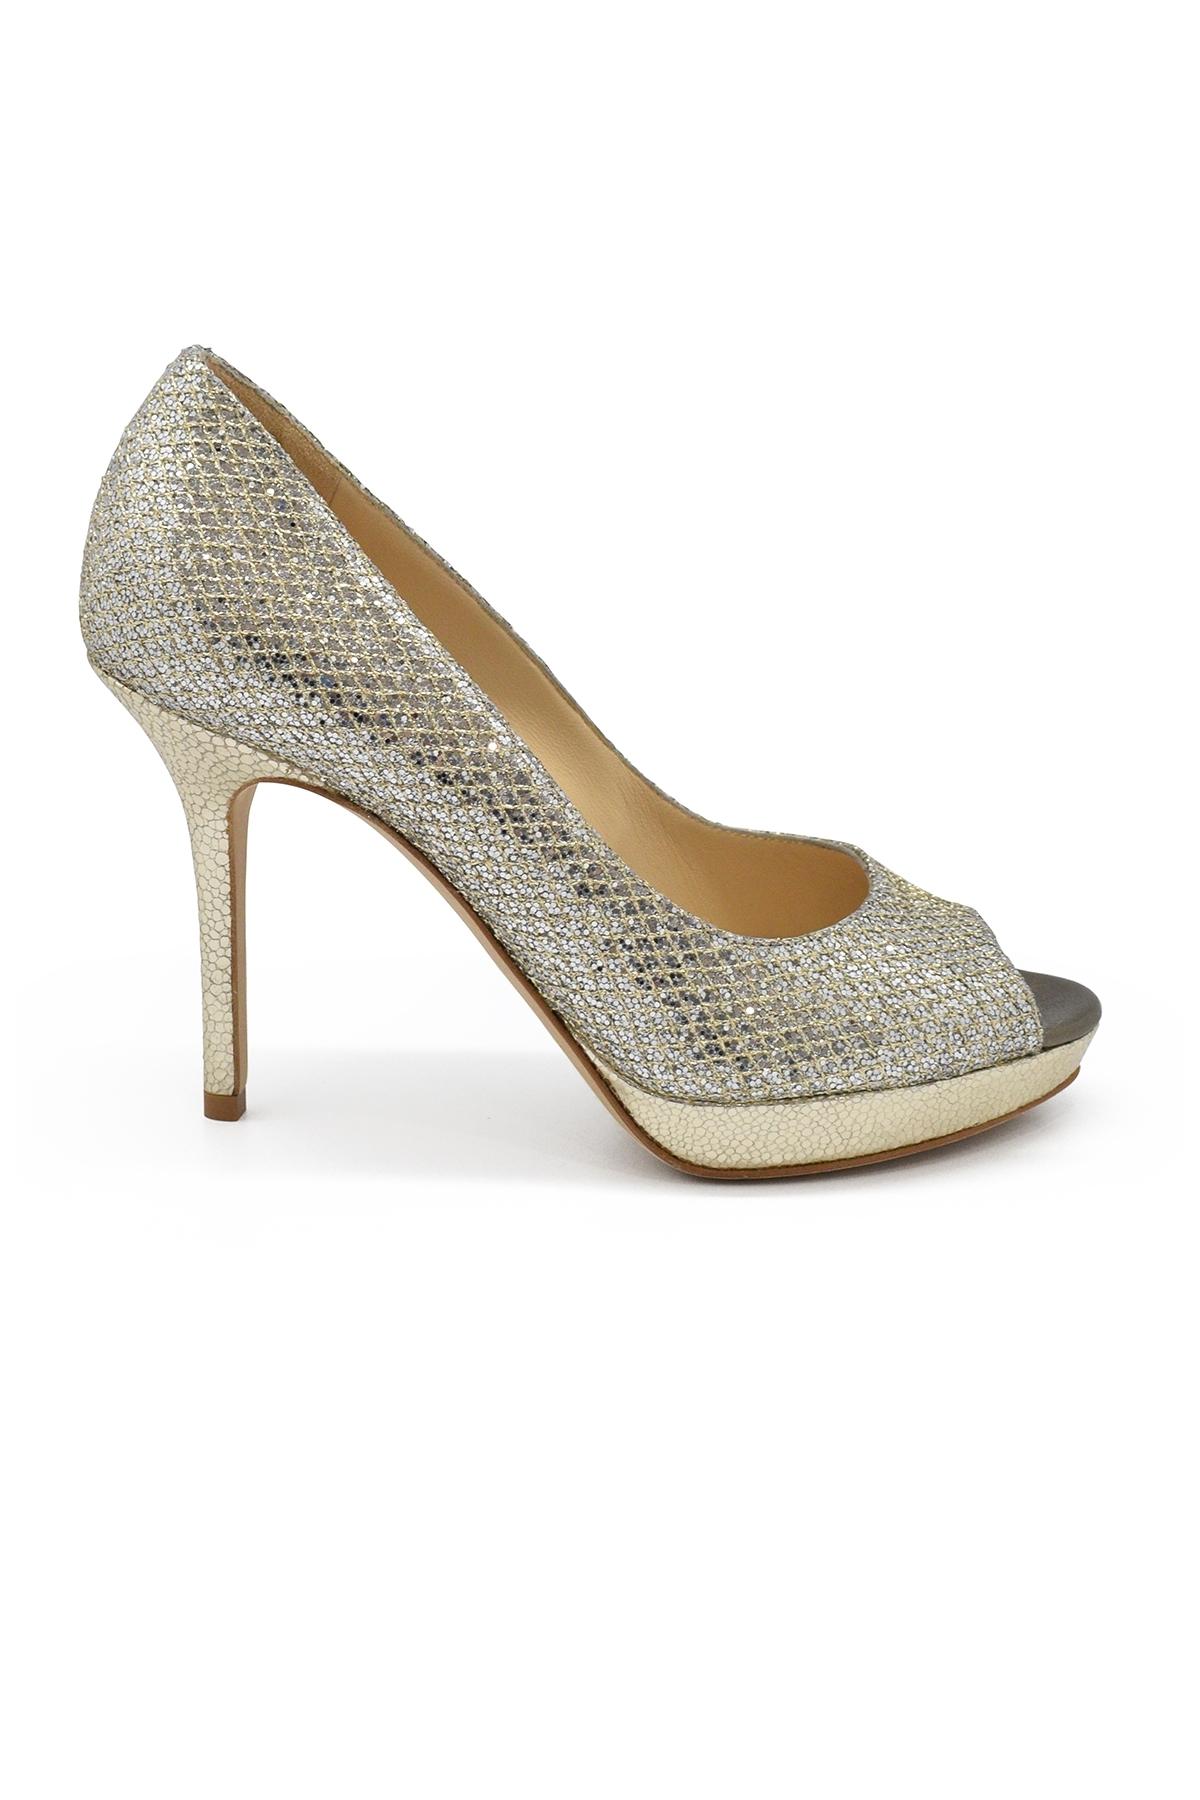 Luna Jimmy Choo gold glitter open toe pumps